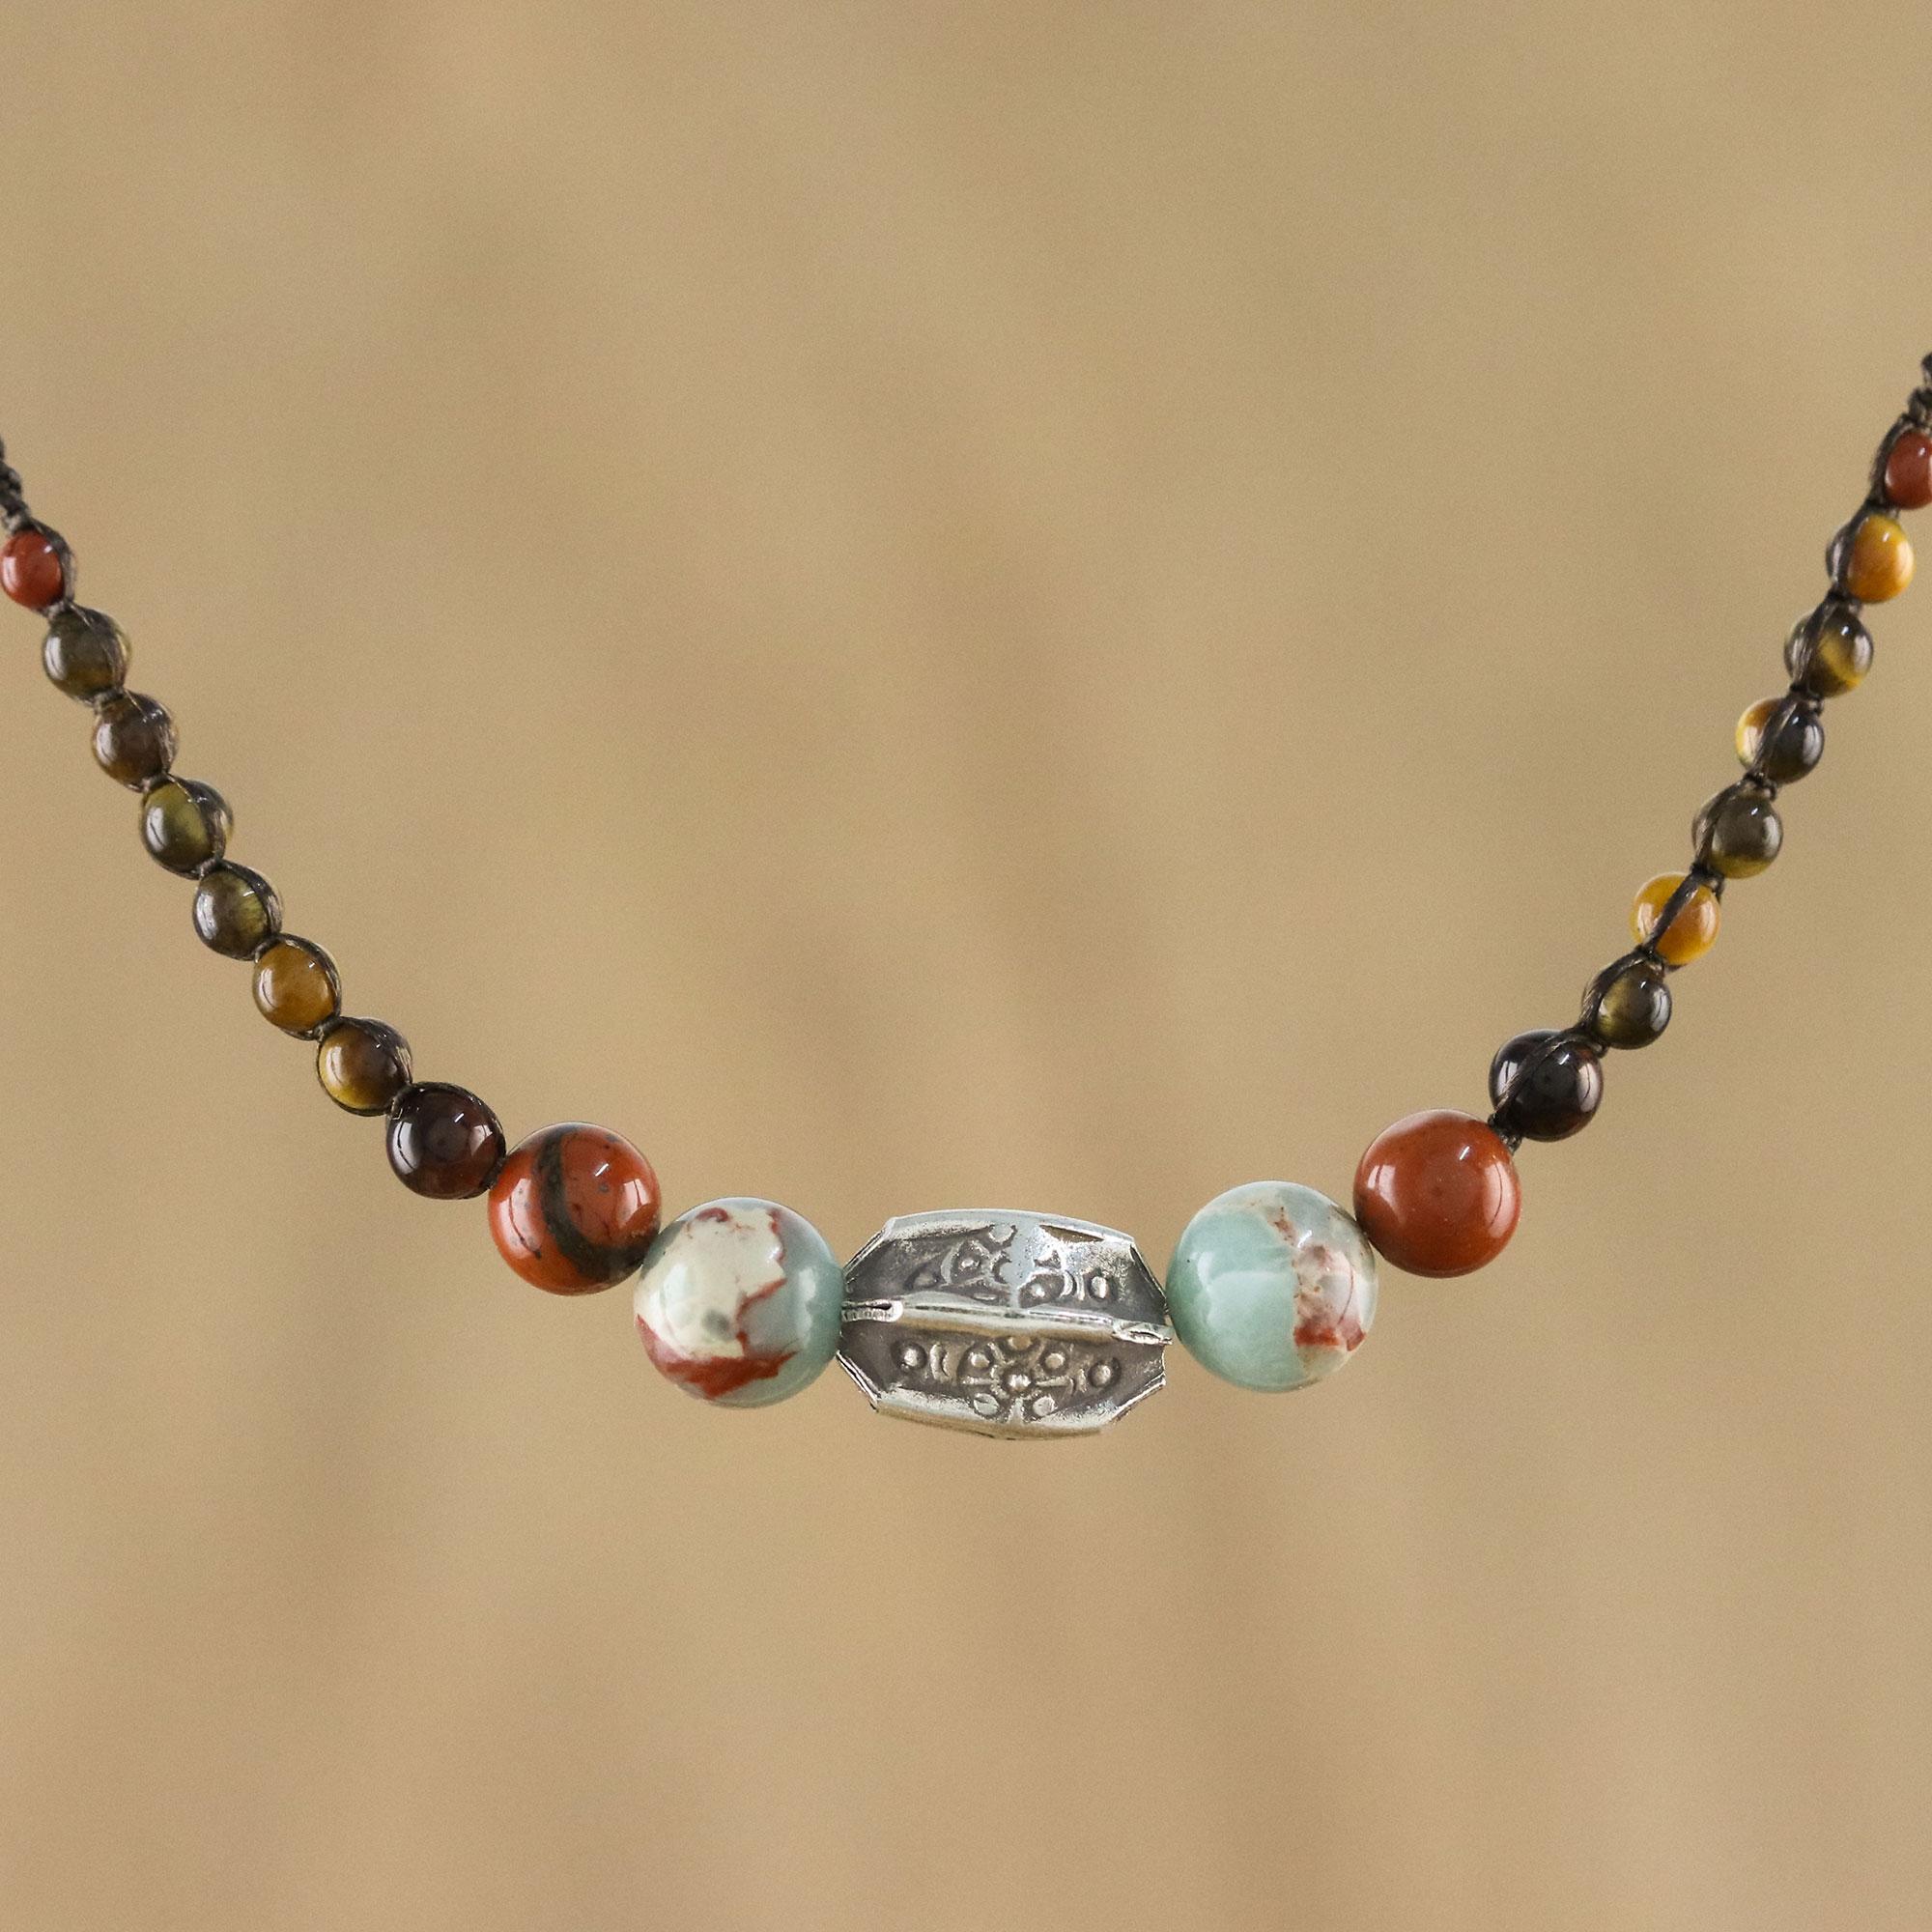 Multi-Gemstone and Karen Silver Beaded Macrame Necklace - Earthbound ...